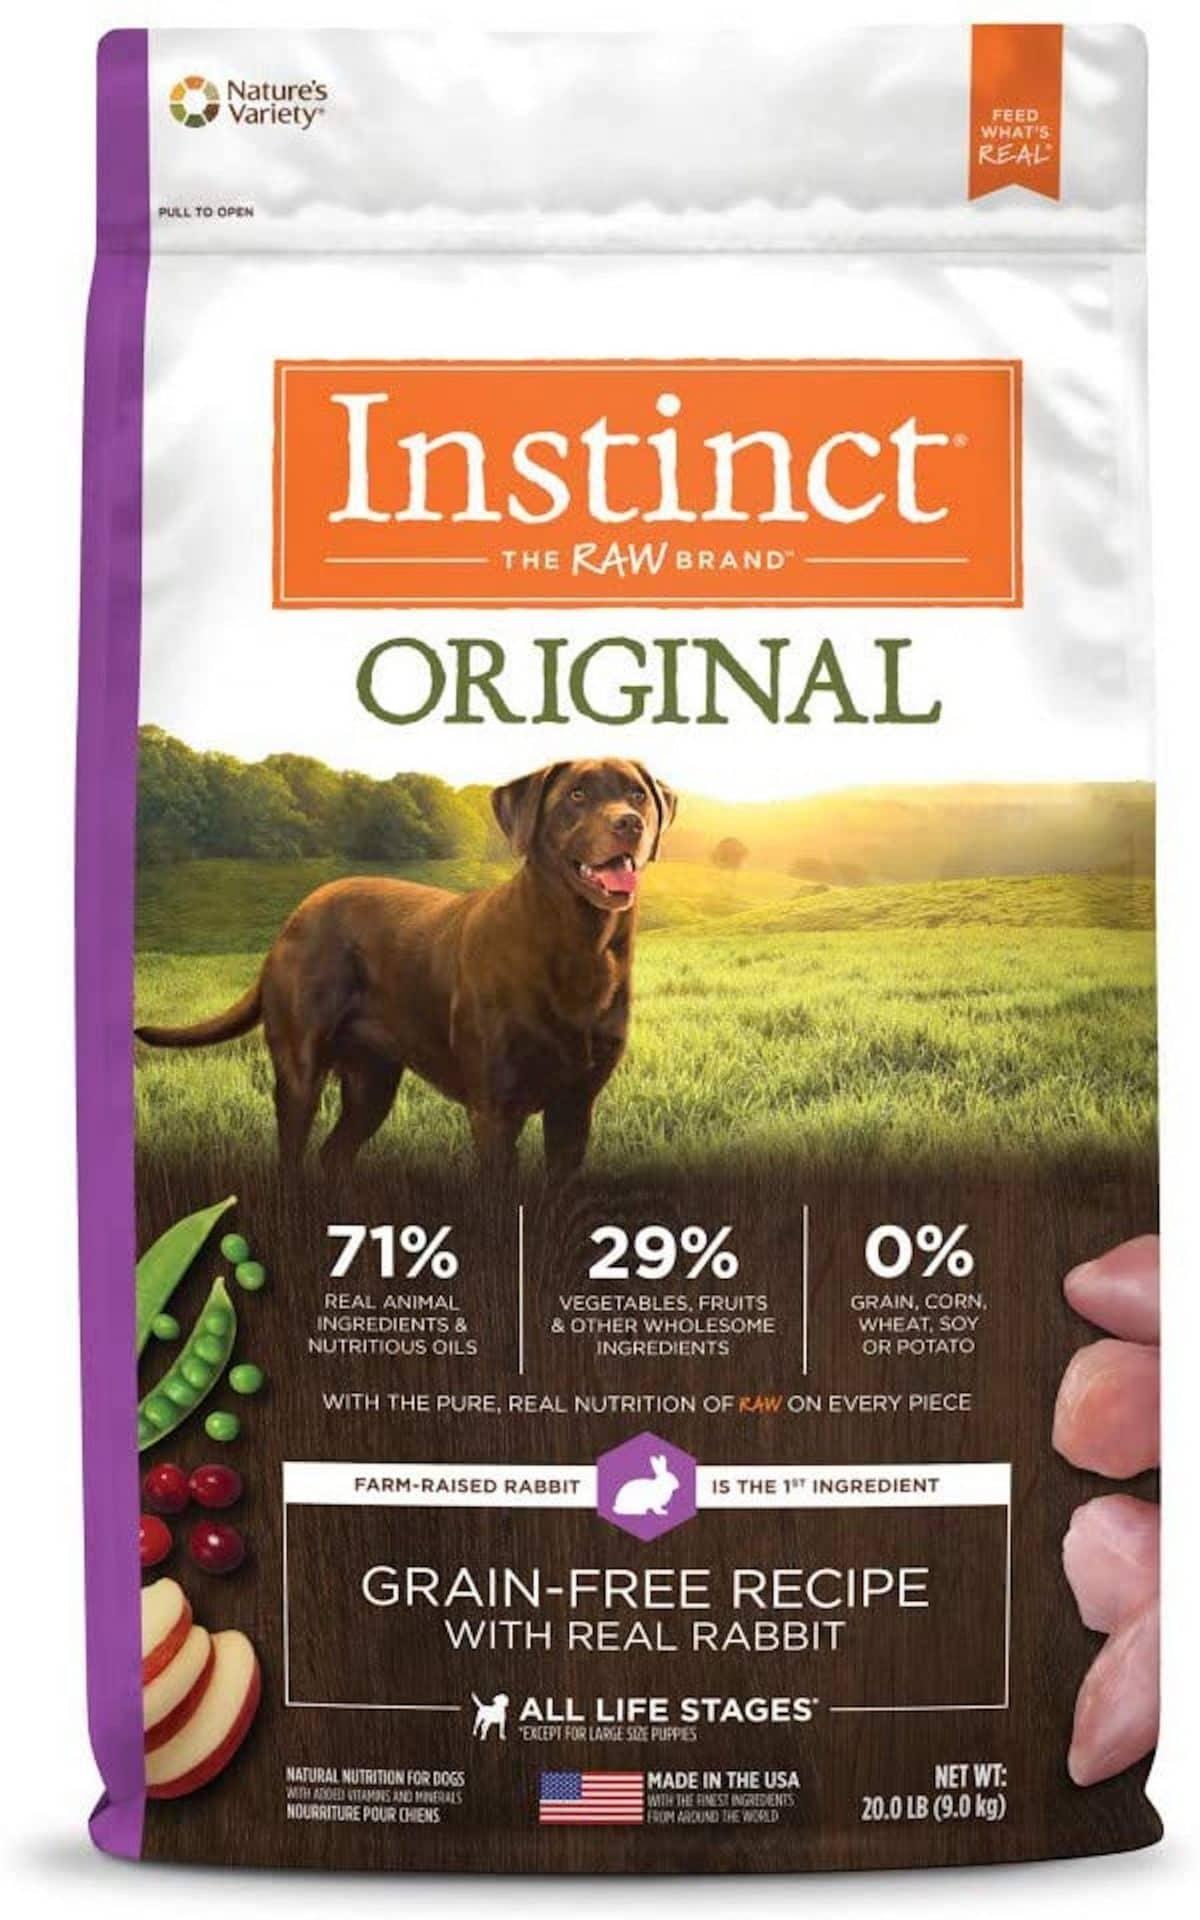 Nature's Variety Instinct Grain-Free Recipe with Real Rabbit